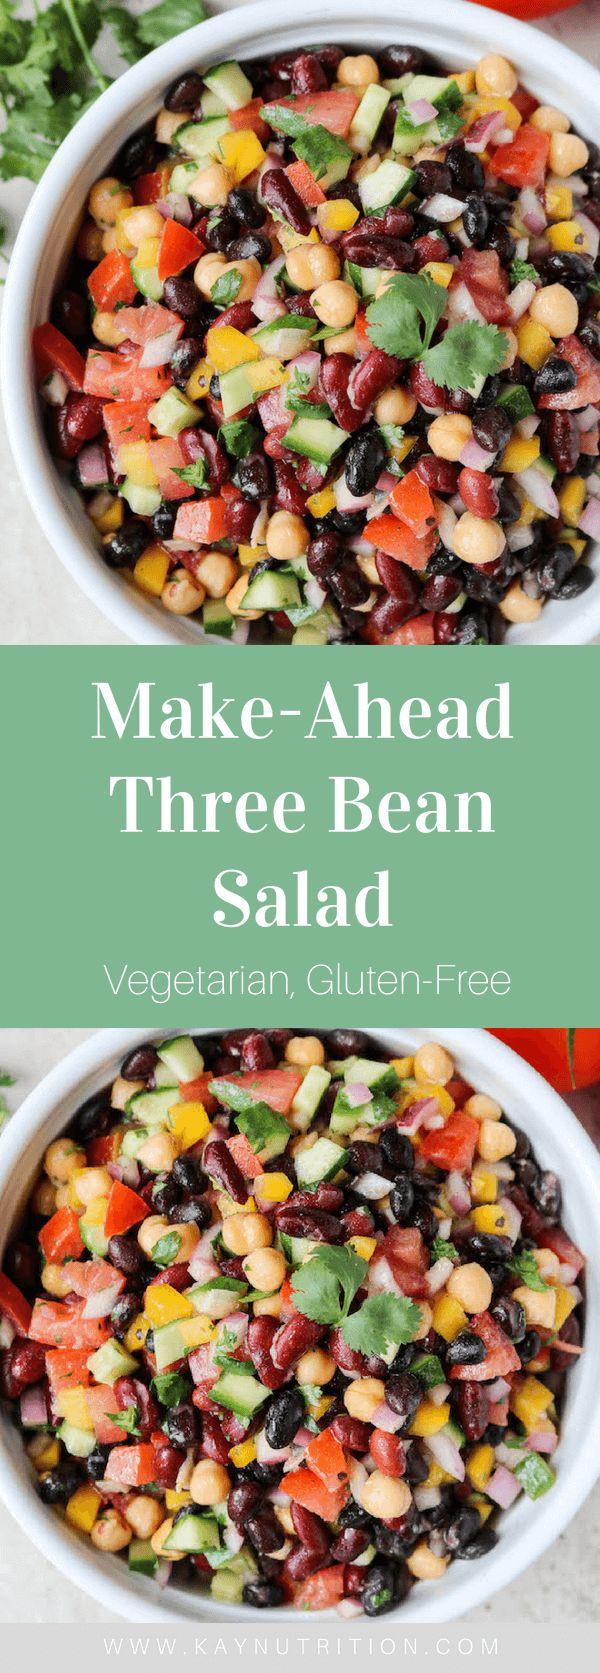 4f37e2c6e758f1f5b3497fbb9d286b1e Make Ahead Three Bean Salad  #beansalad #mealprep #lunch #healthy #recipes